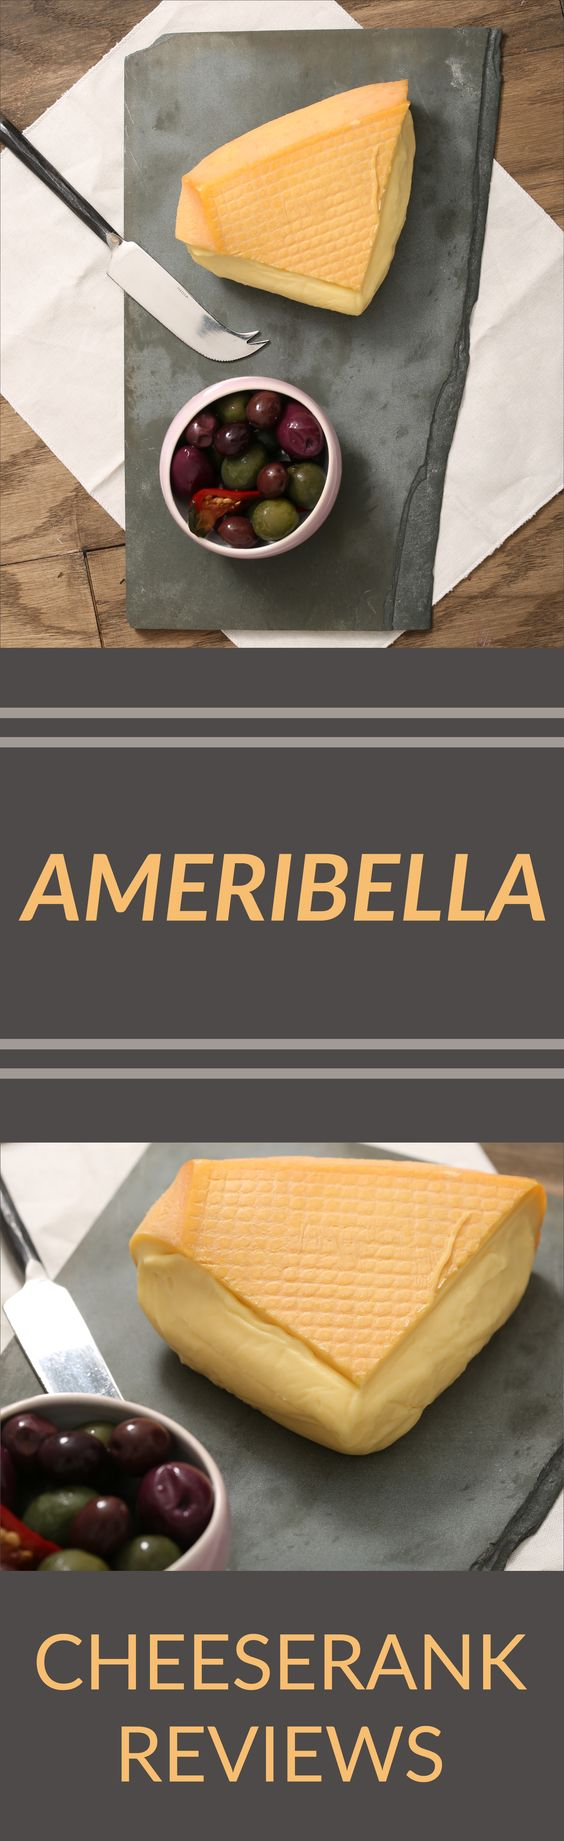 Ameribella